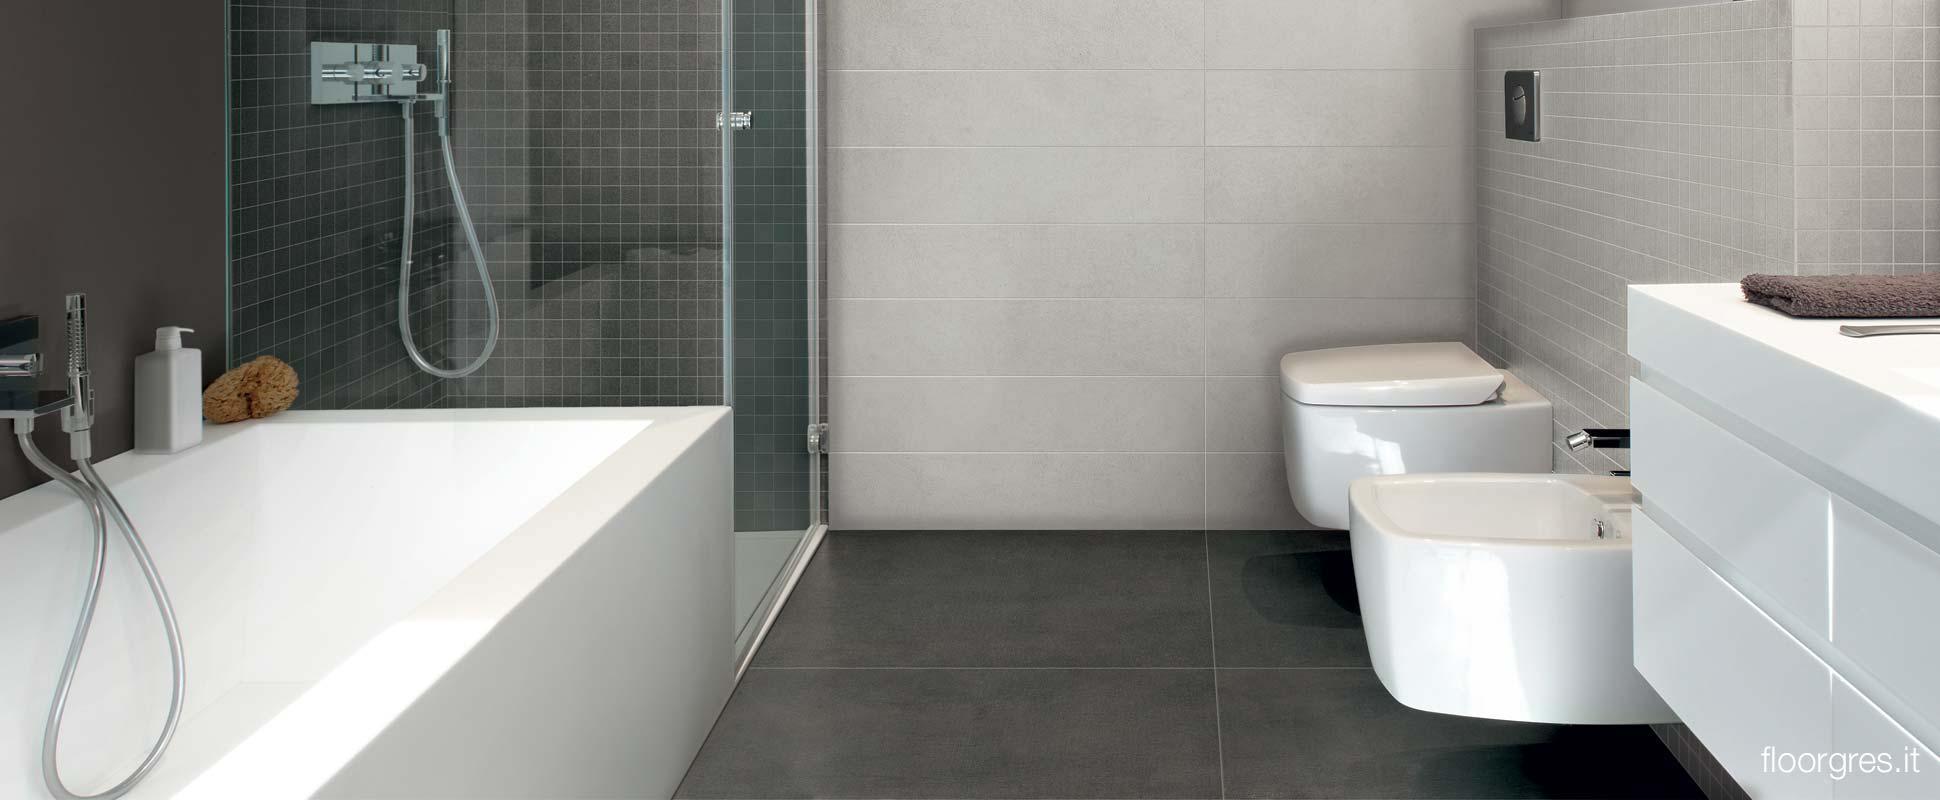 Tono Bagno - Floorgress Floortech baño1